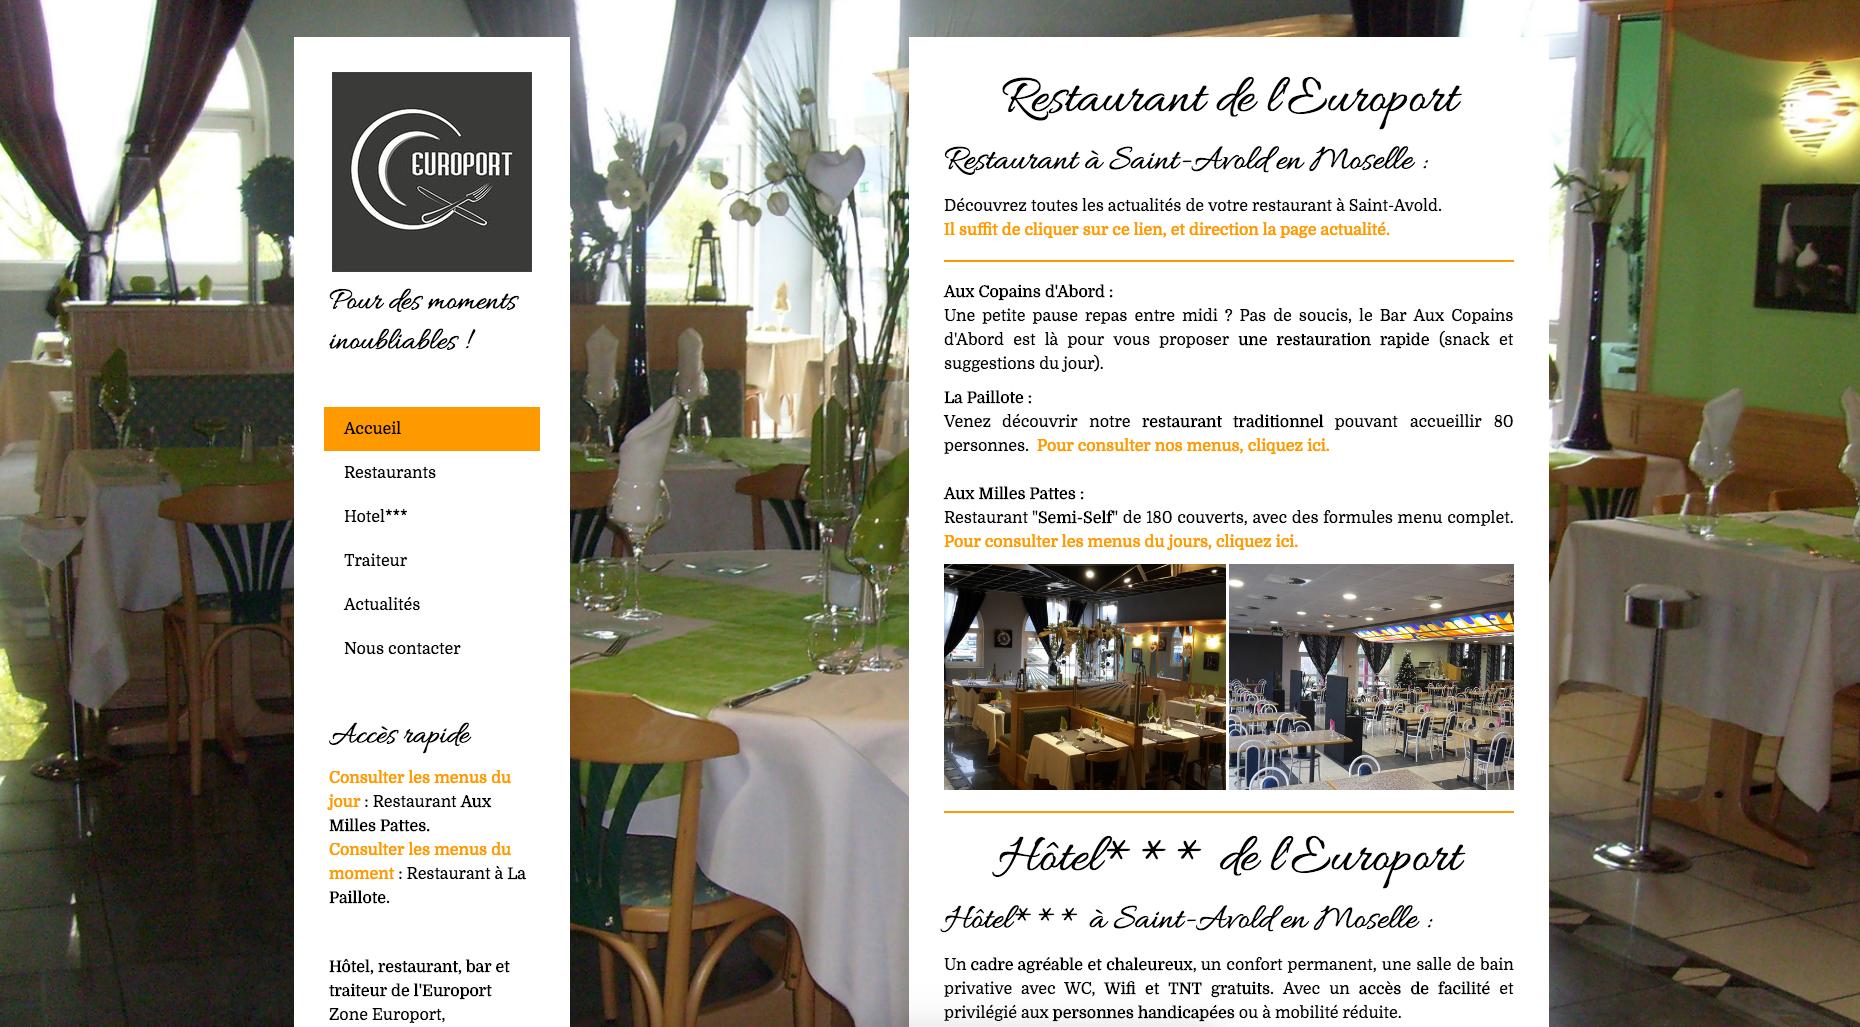 http://www.hotel-restaurant-europort.com/